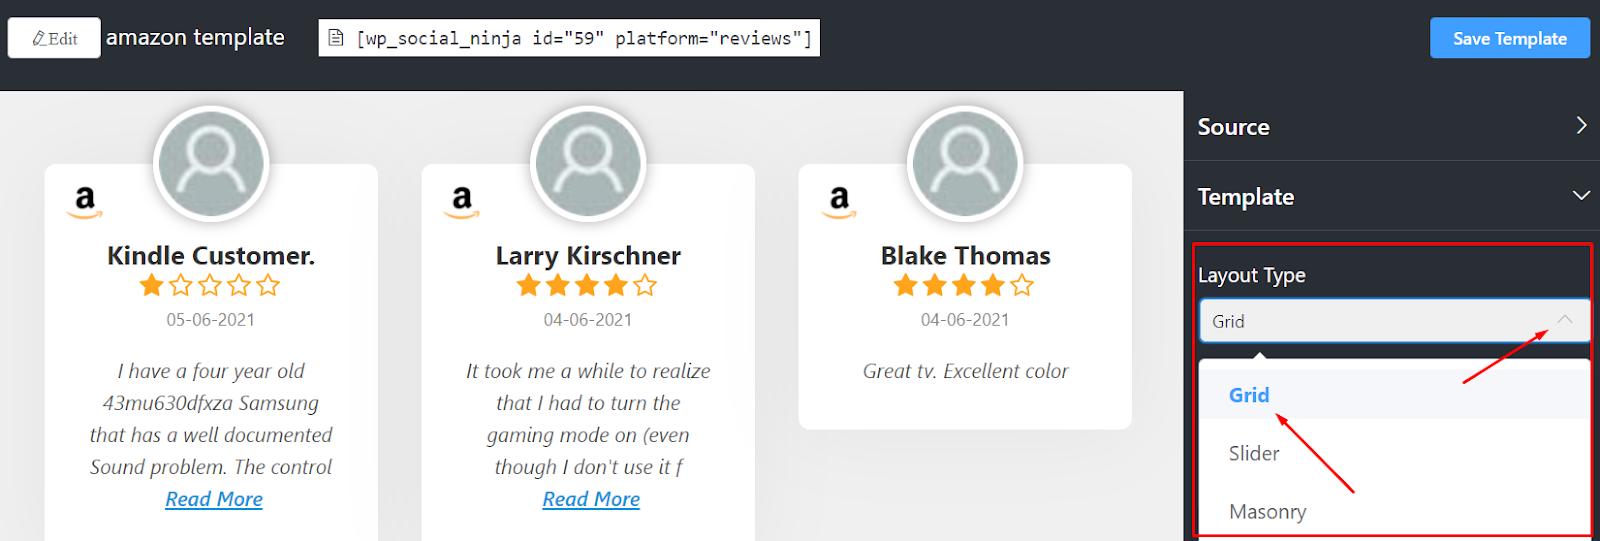 Amazon reviews layout type